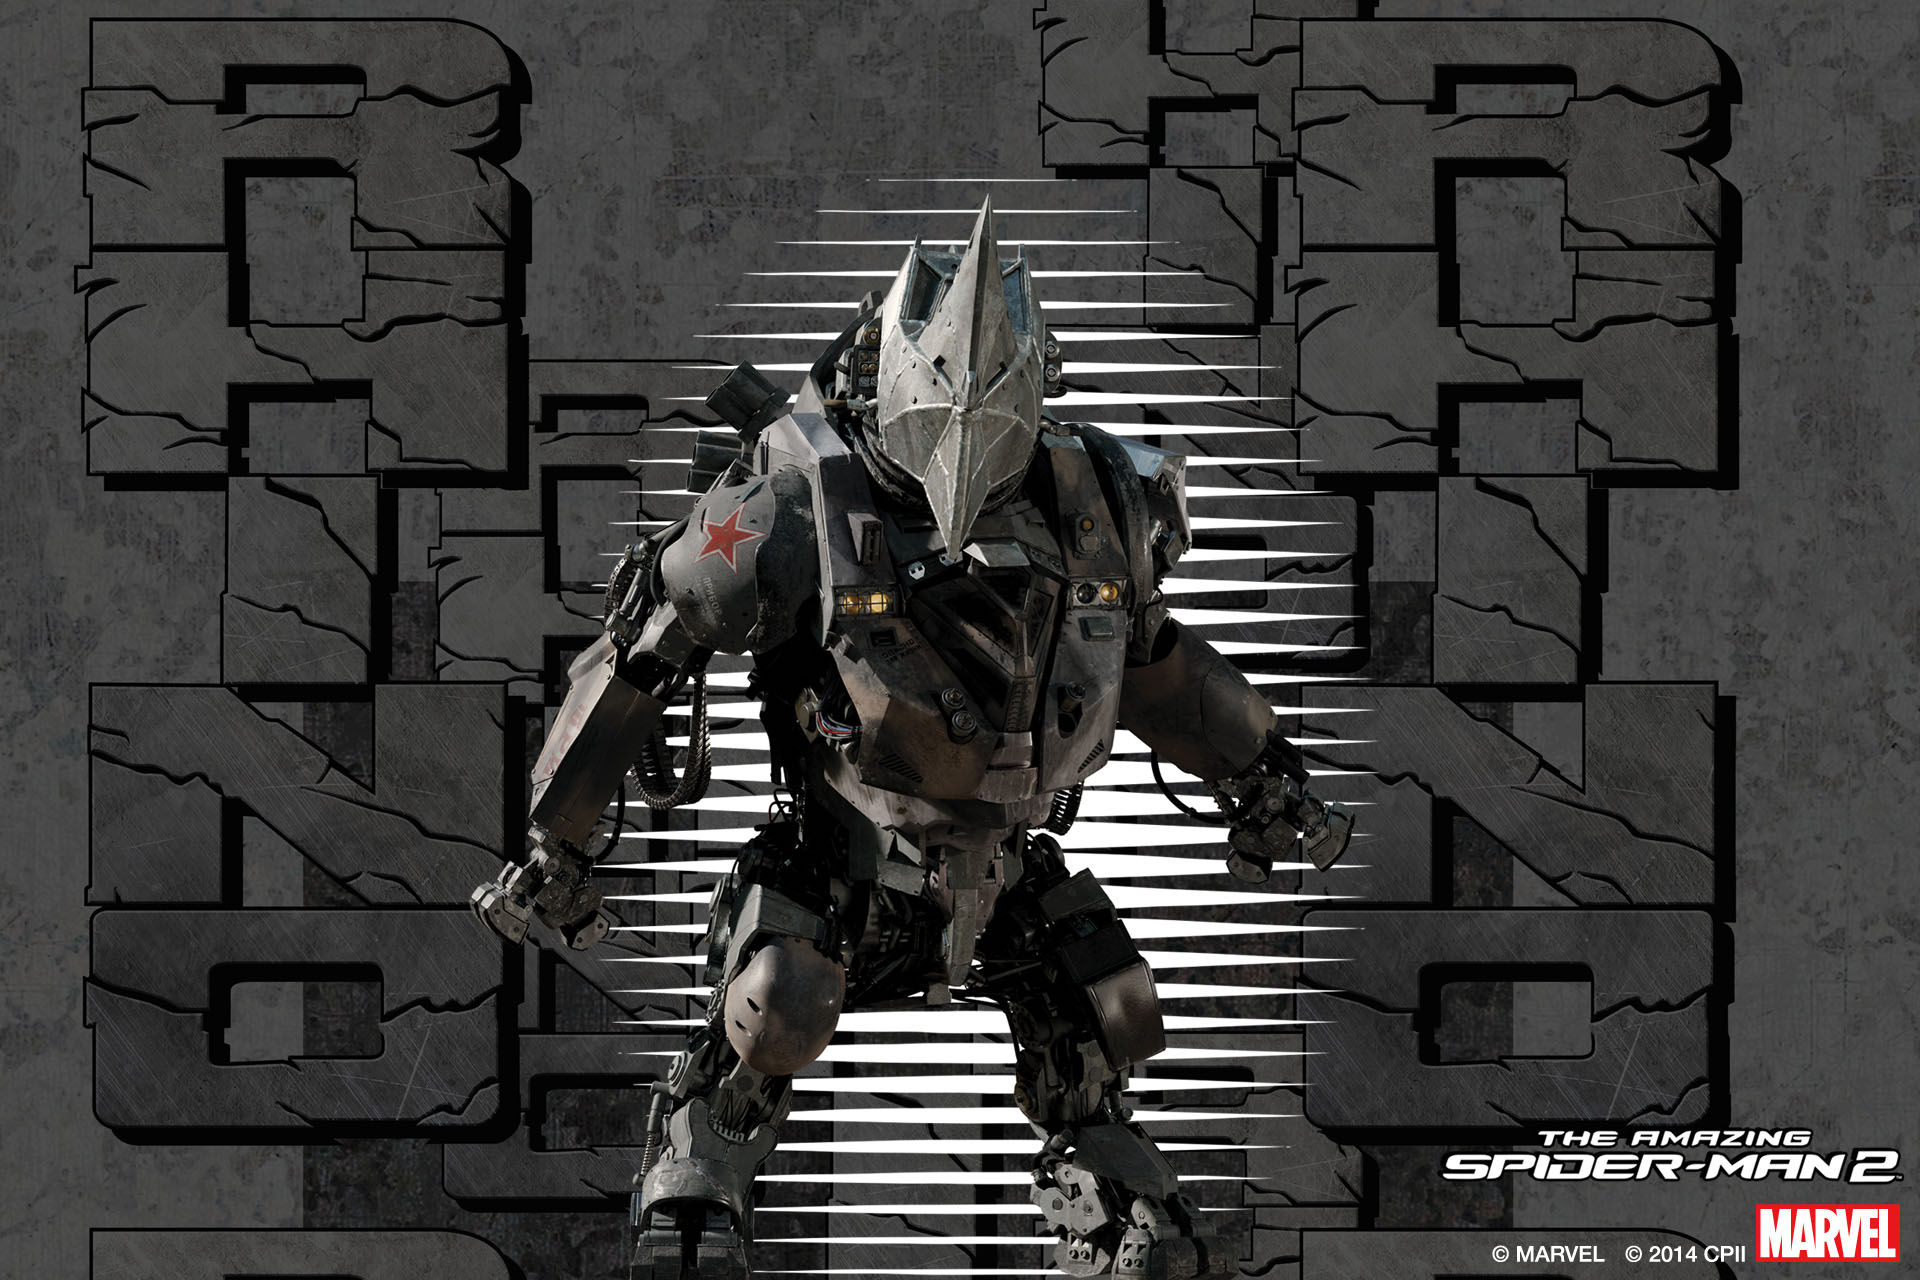 image - desktop-wallpaper-4-1- | amazing spider-man wiki